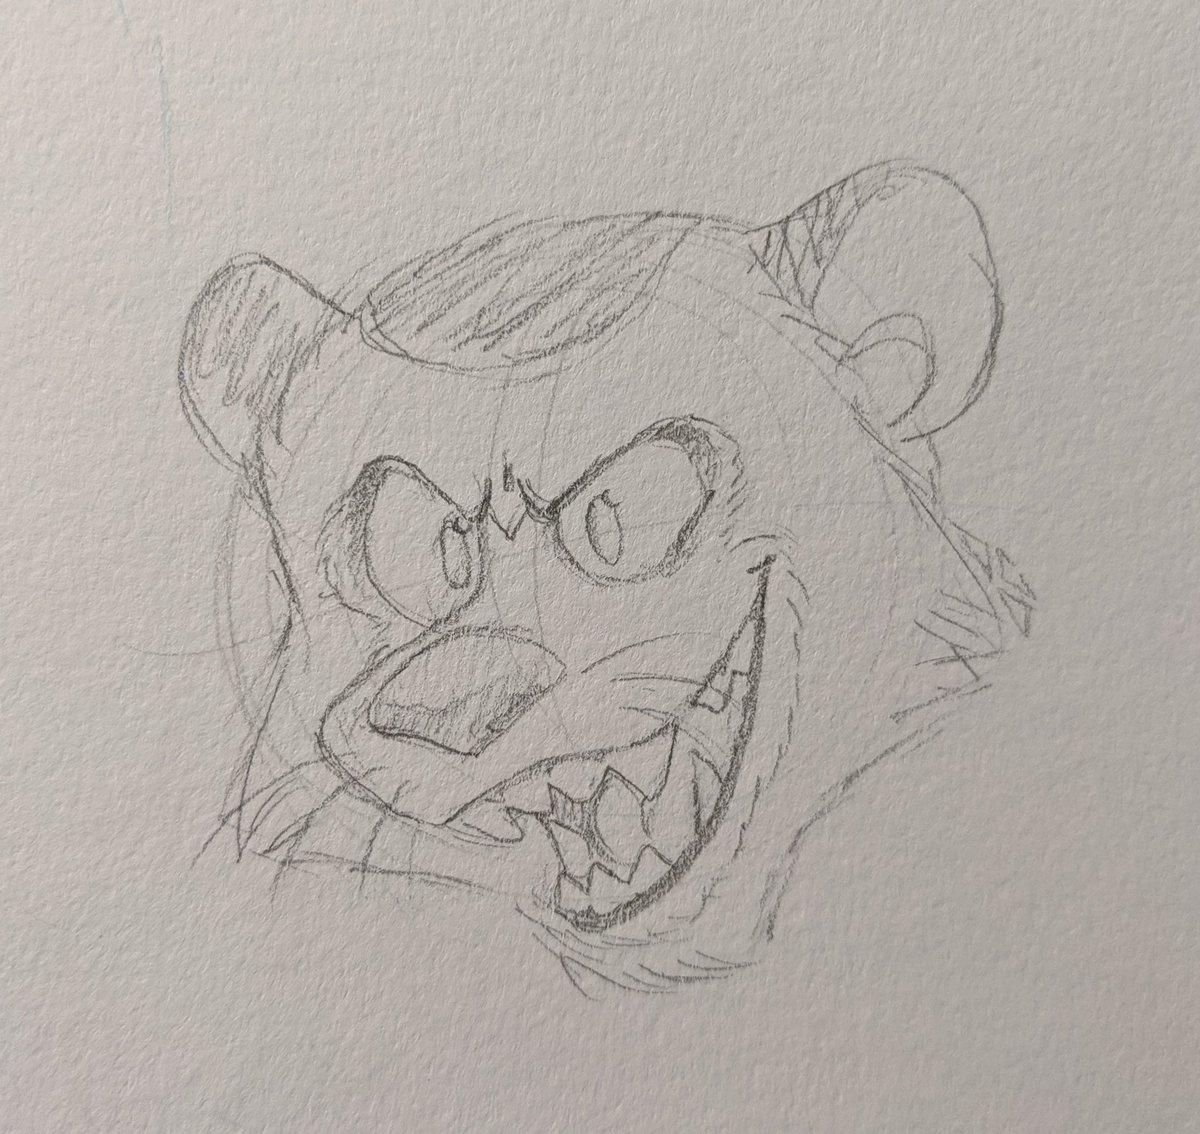 I absolutely ADORE drawing this feral man #allhailkingjulien #ahkj #ahkjpancho https://t.co/Y7oz9sK39h